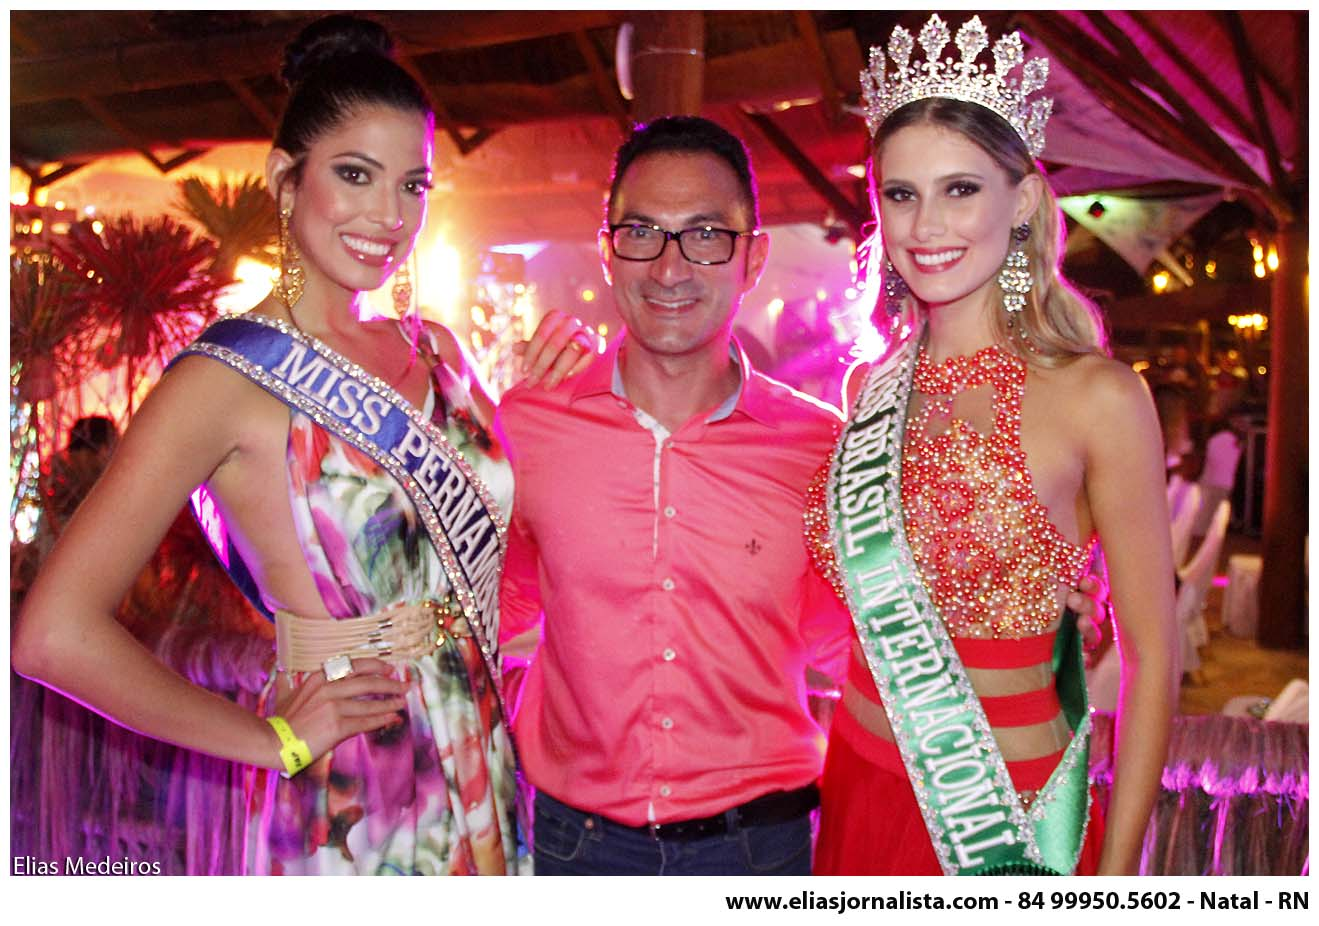 isis stocco, miss brasil internacional 2015. - Página 4 Rmuusxx8